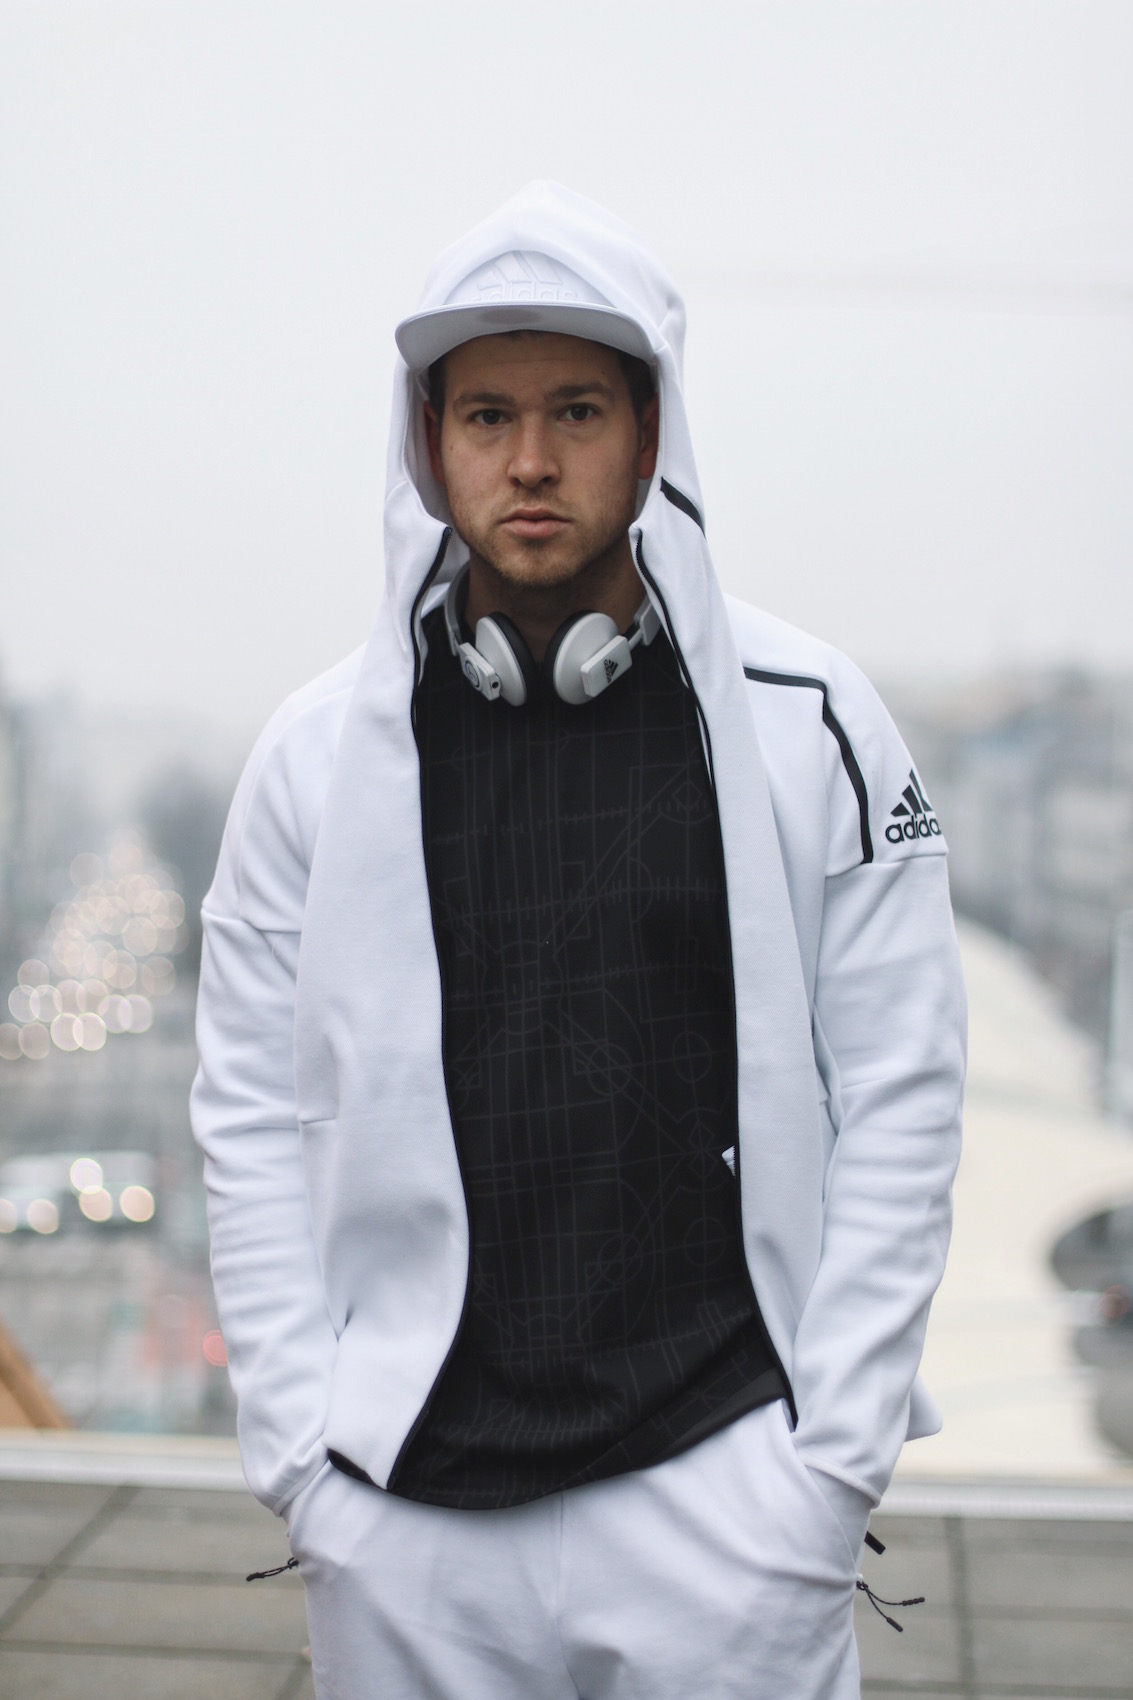 Adidas ZNE Hoodie_Adidas Austria_Meanwhile in Awesometown_Wiener Männerblog Modeblog Männermode Lifestyleblog8